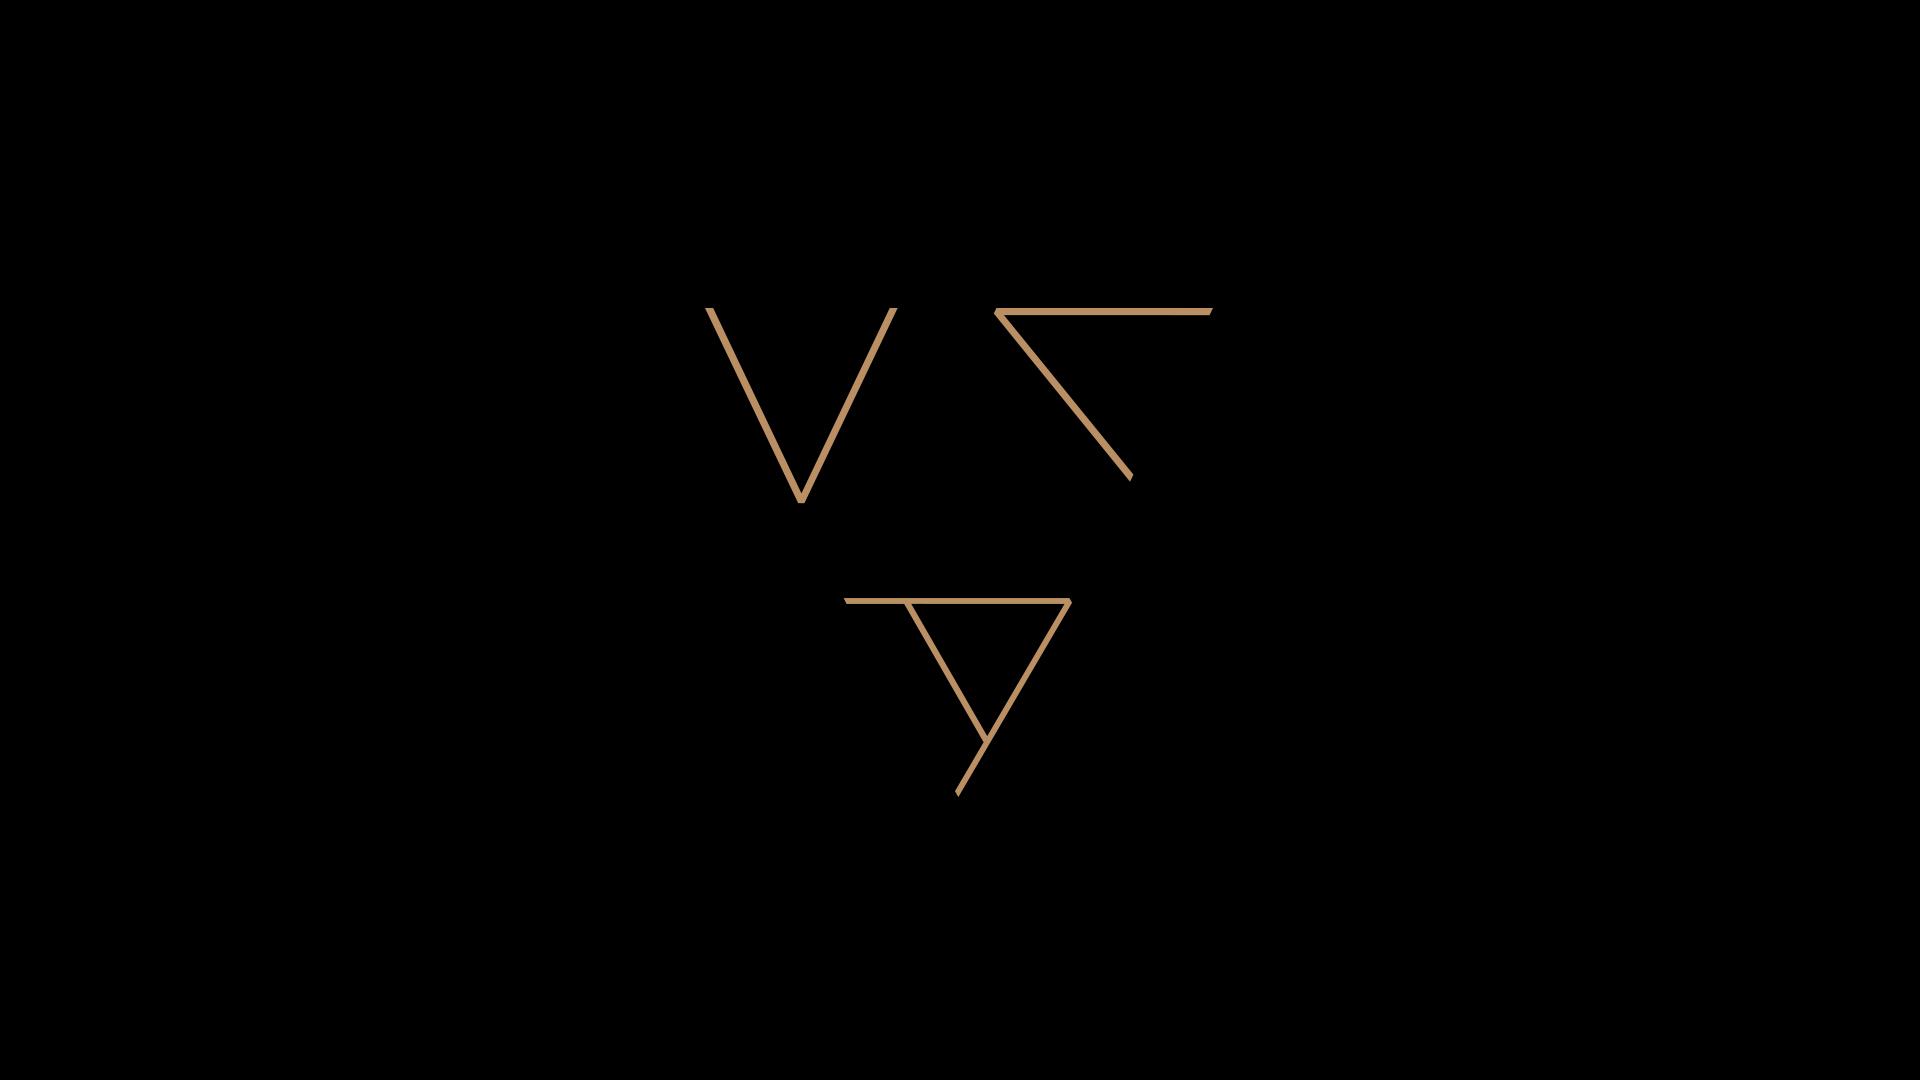 thumb-veravin-2